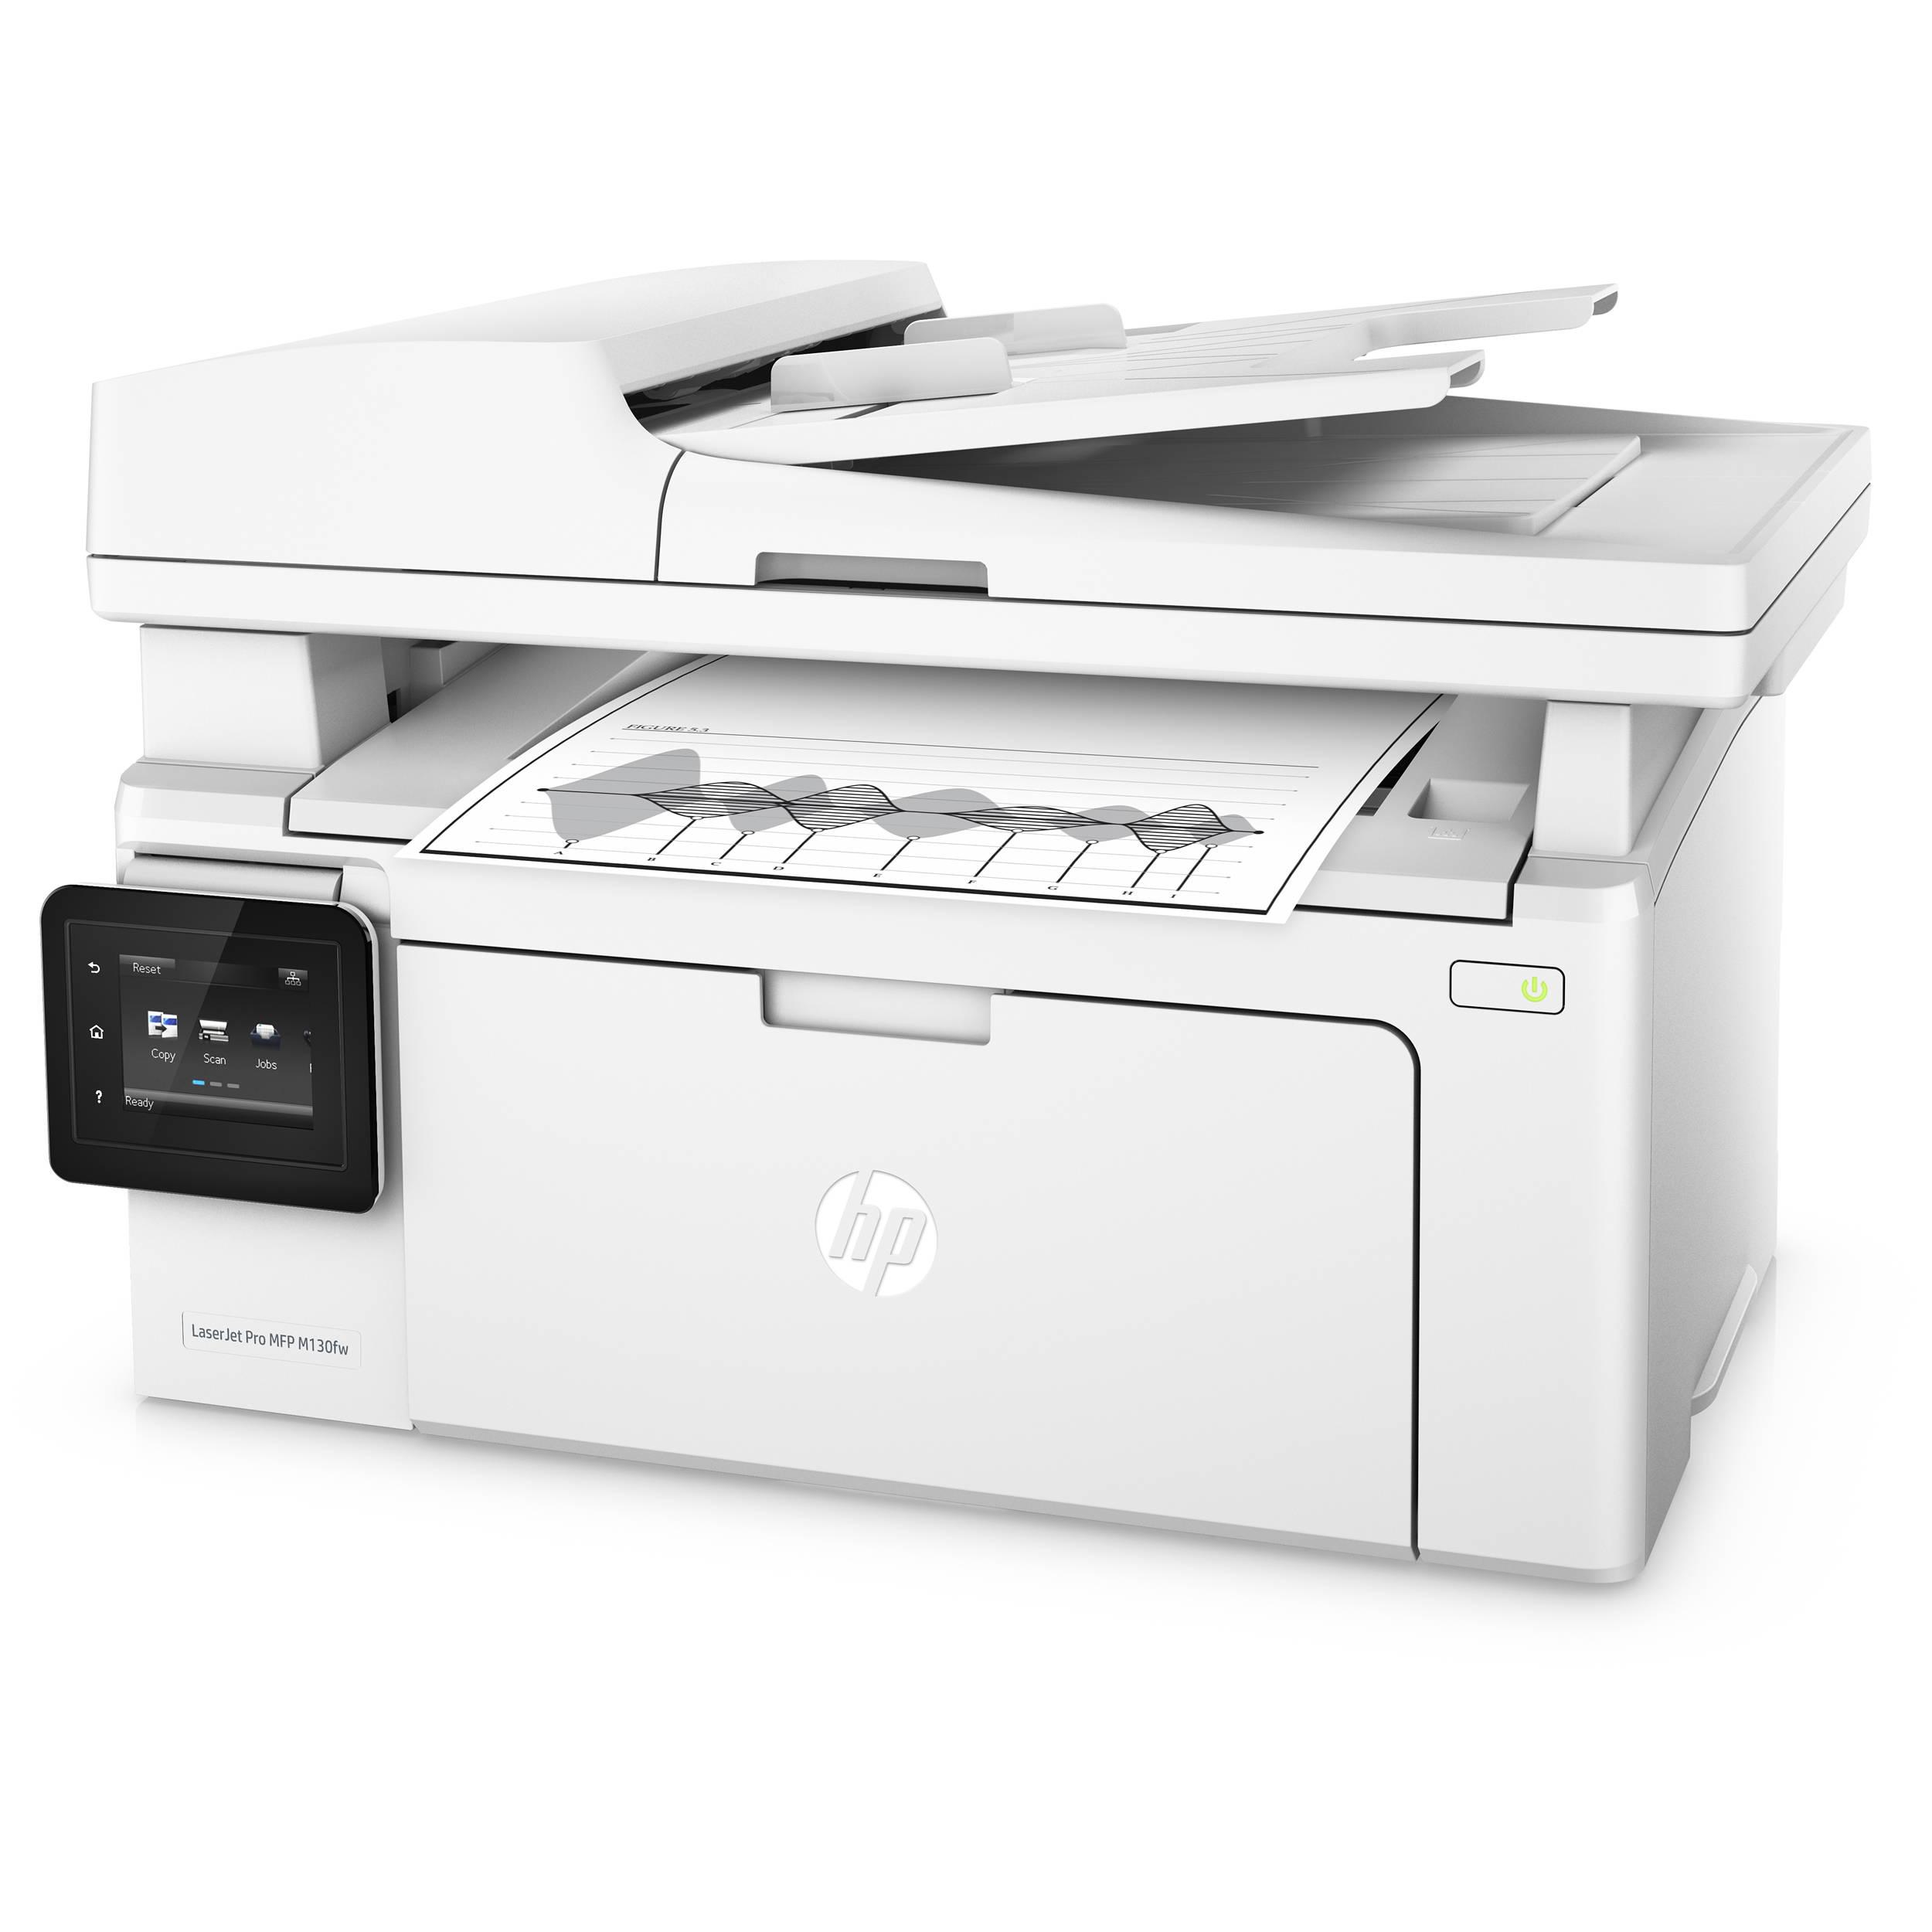 54510b9791ab HP LaserJet Pro M130fw All-in-One Monochrome Laser Printer